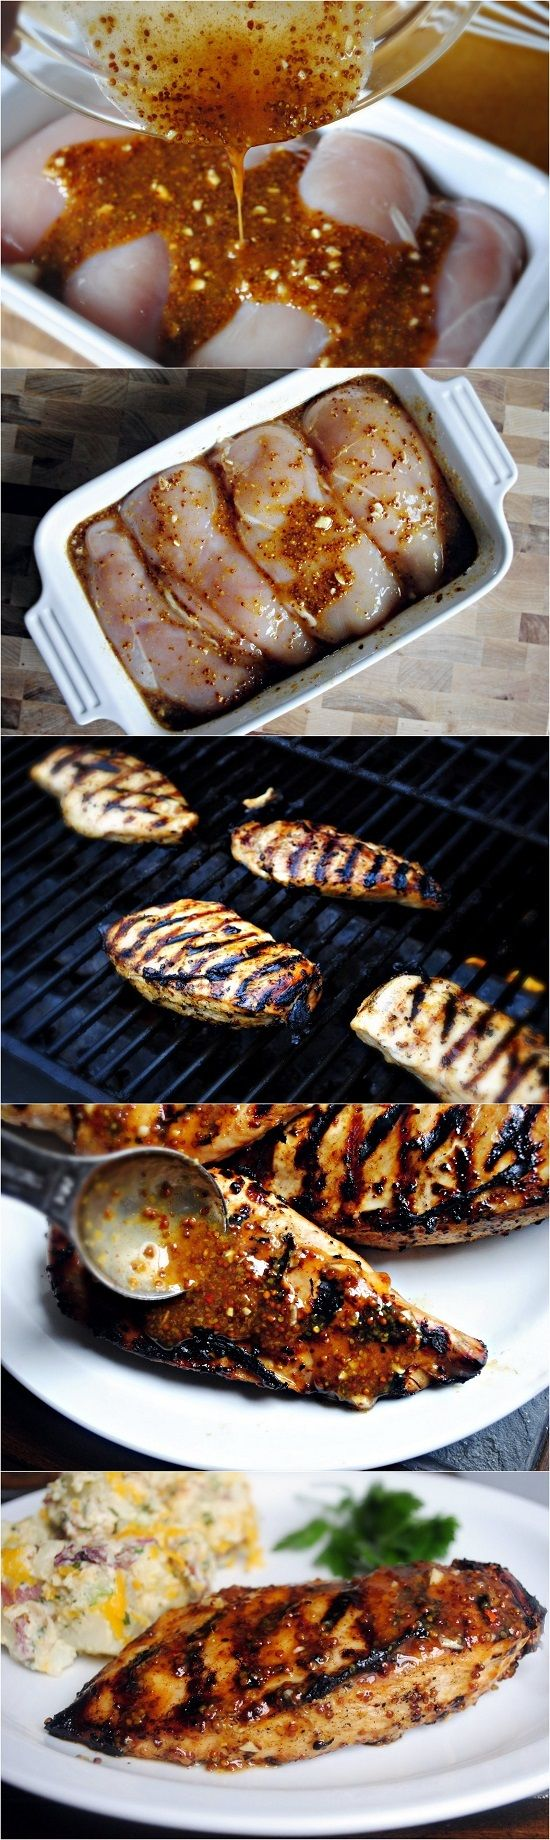 Grilled Honey Mustard Chicken | Dinner Choices | Pinterest | Honey ...